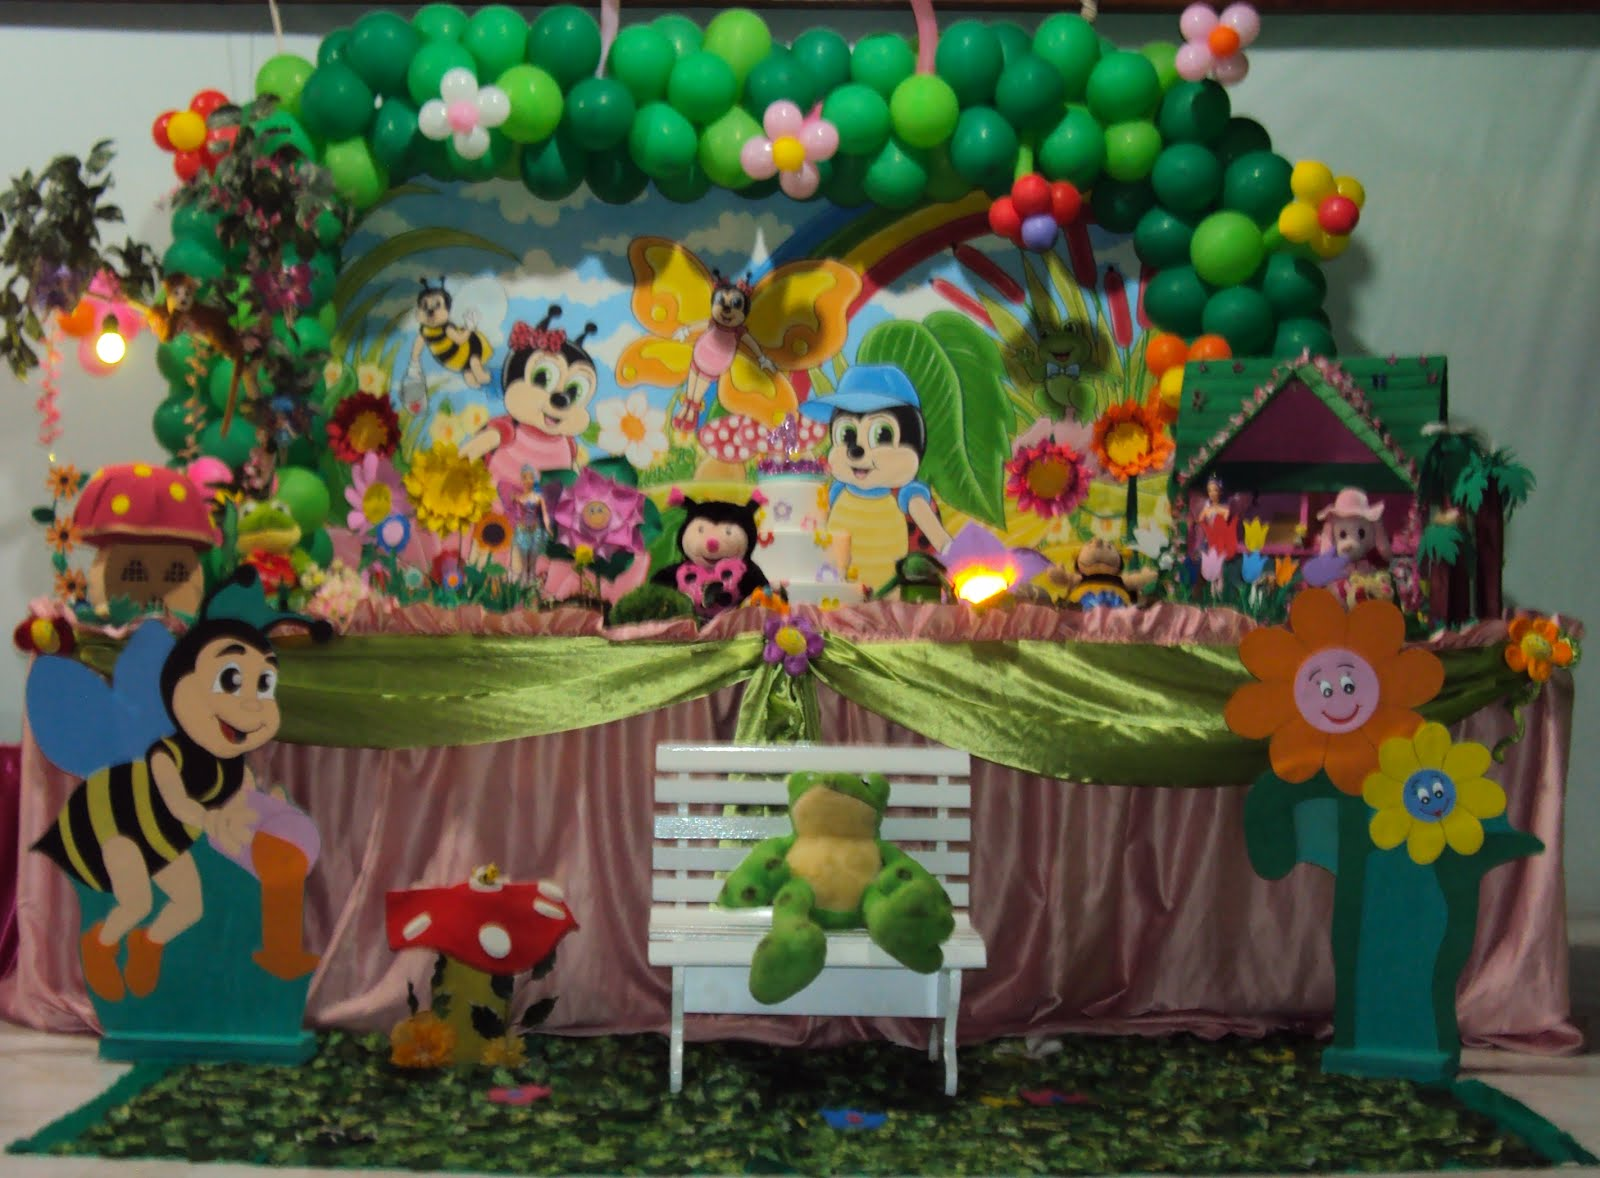 decoracao jardim encantado festa infantil:Sirlei Festas infantil-Rua:Oreade 174 Moreninha III Tel:(67)3393-2873